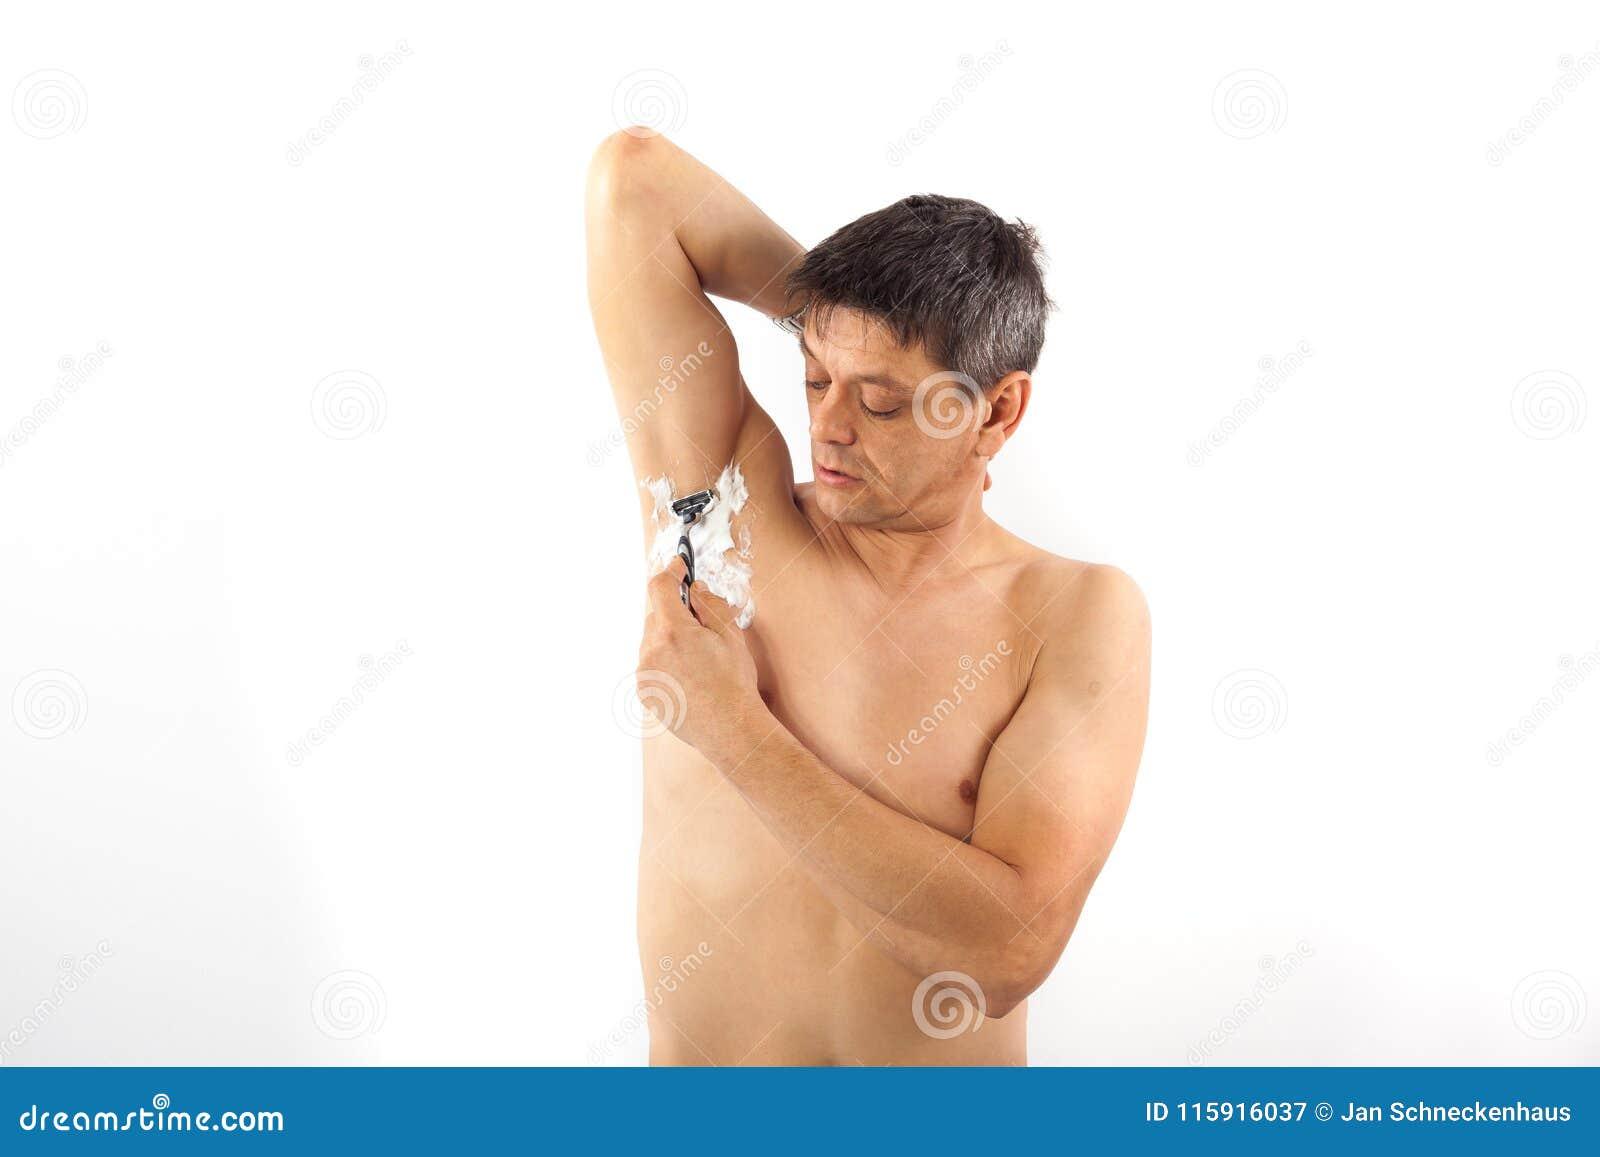 Man shaves his armpit hair